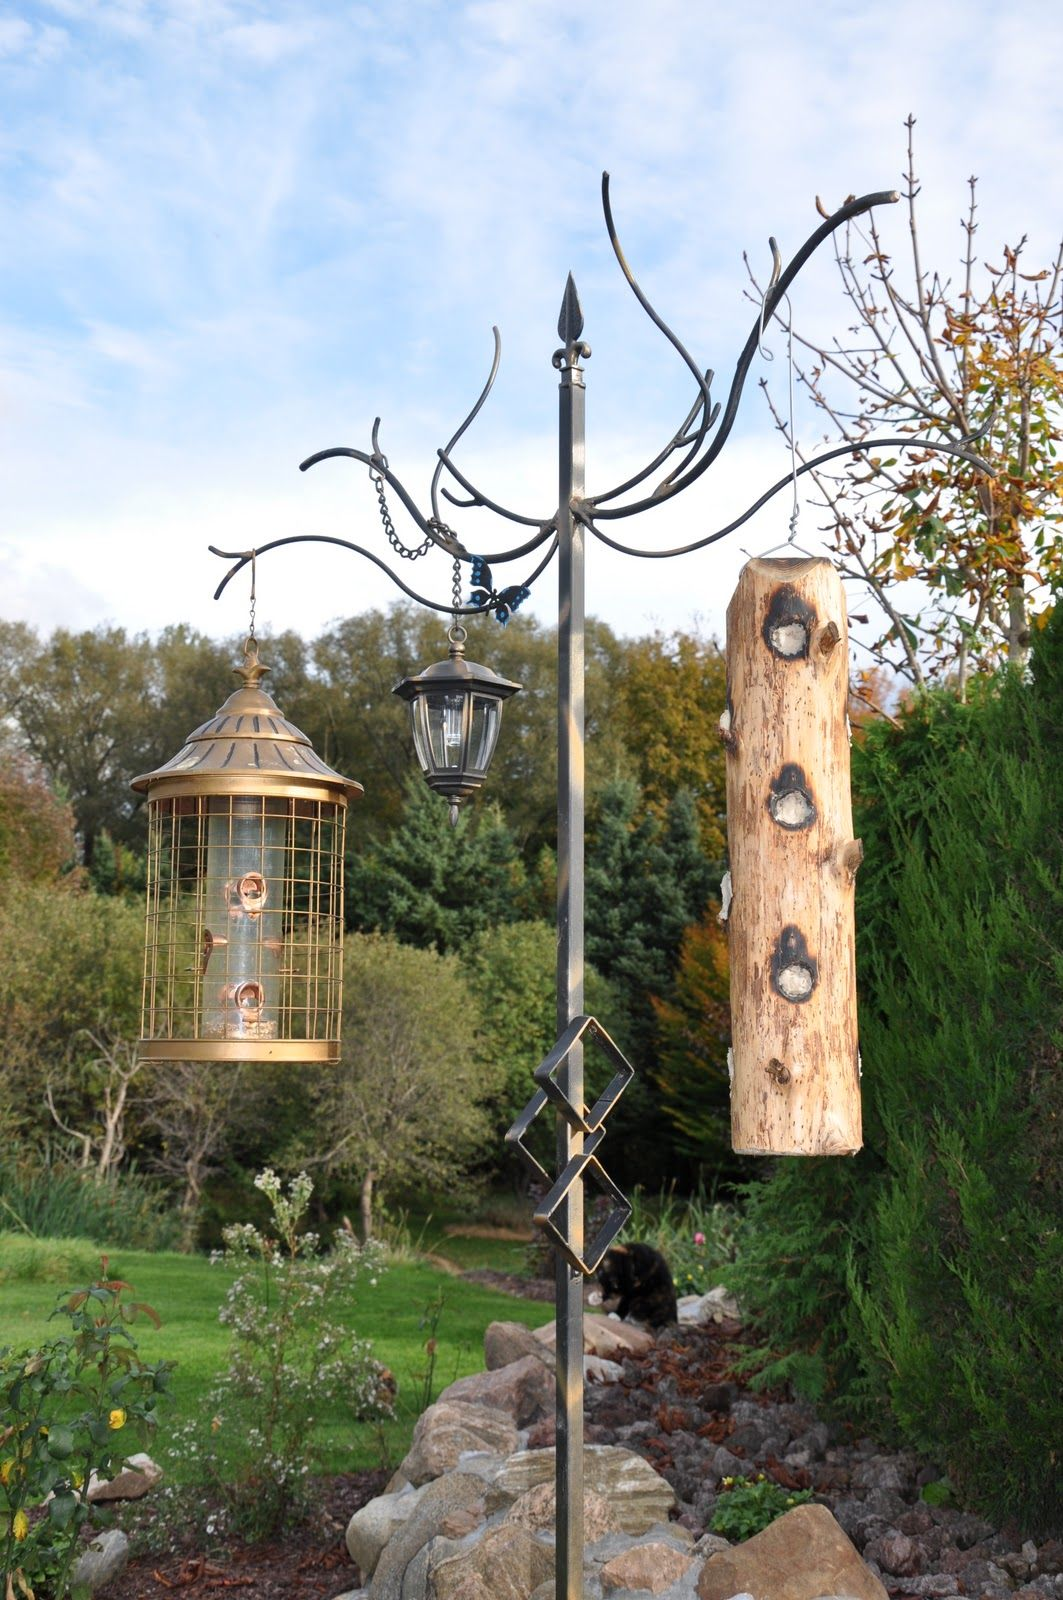 dp bird wild deck feeder garden metal with accessories select adjustable two outdoor amazon kit decks branches stokes hangers com pole for